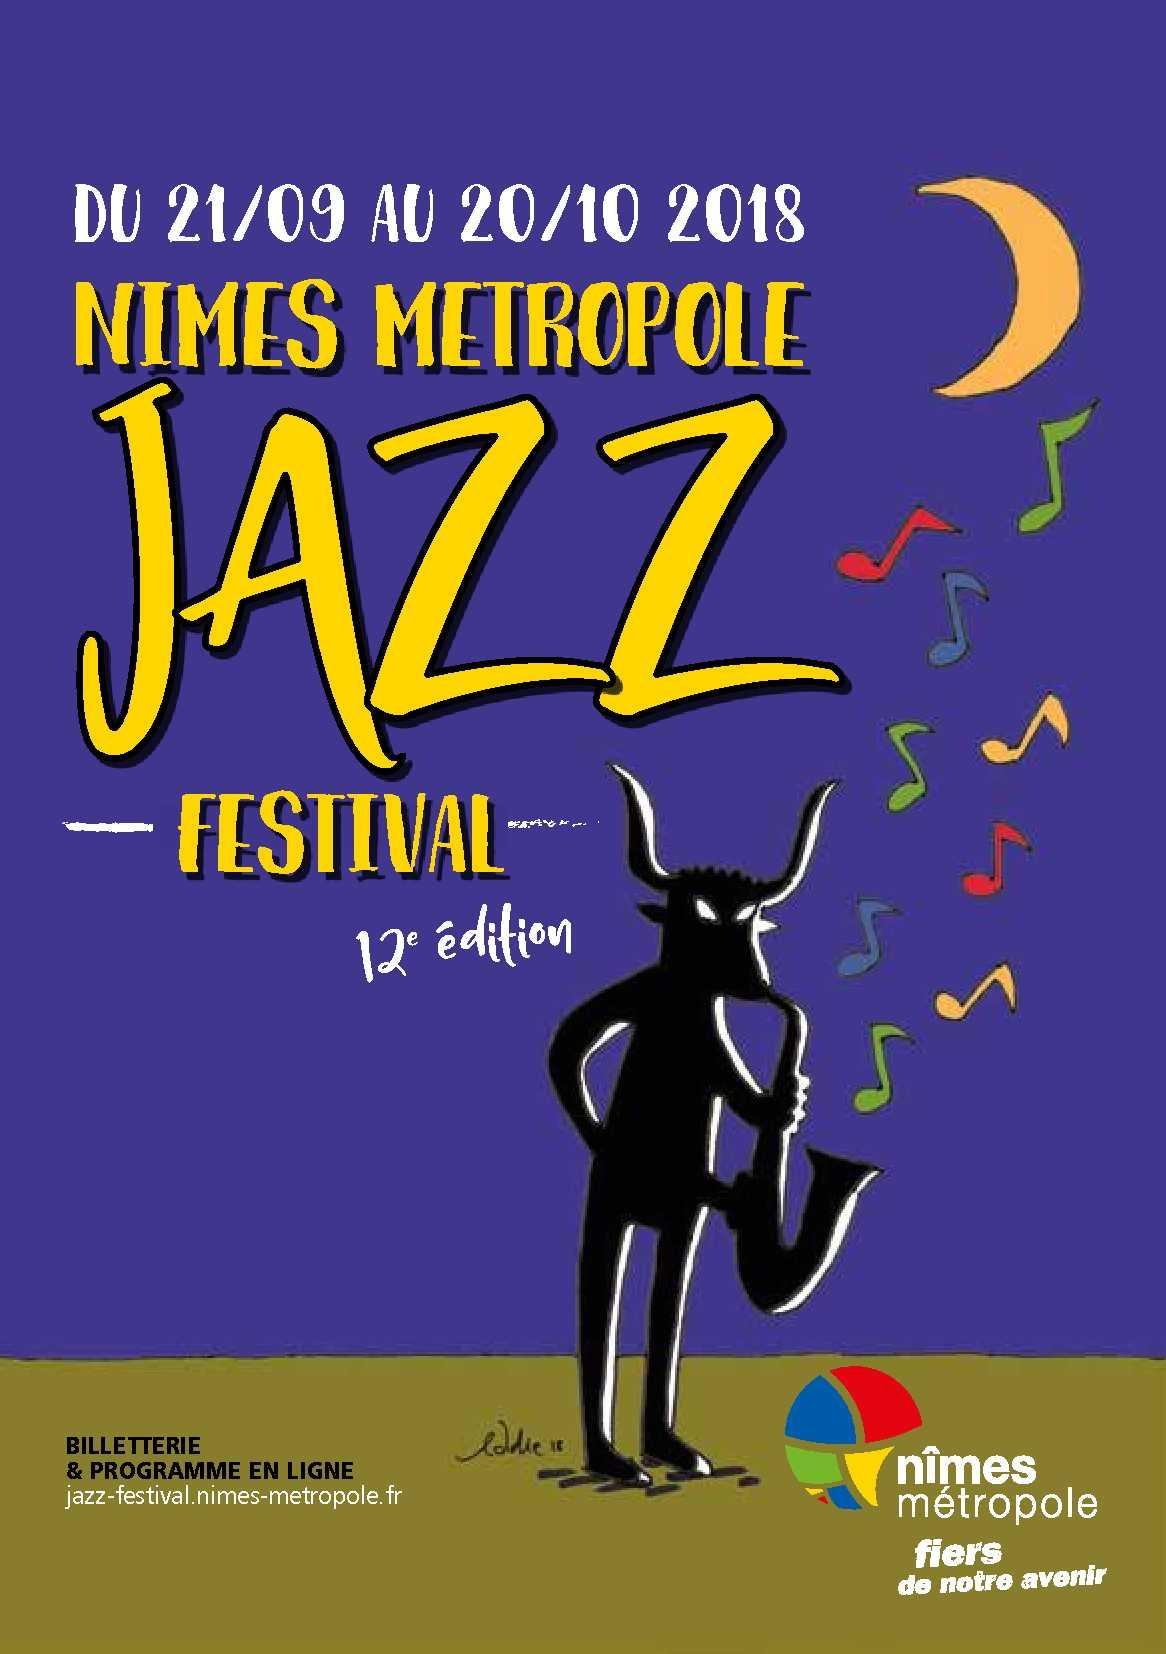 Nimes Metropole Jazz Festival